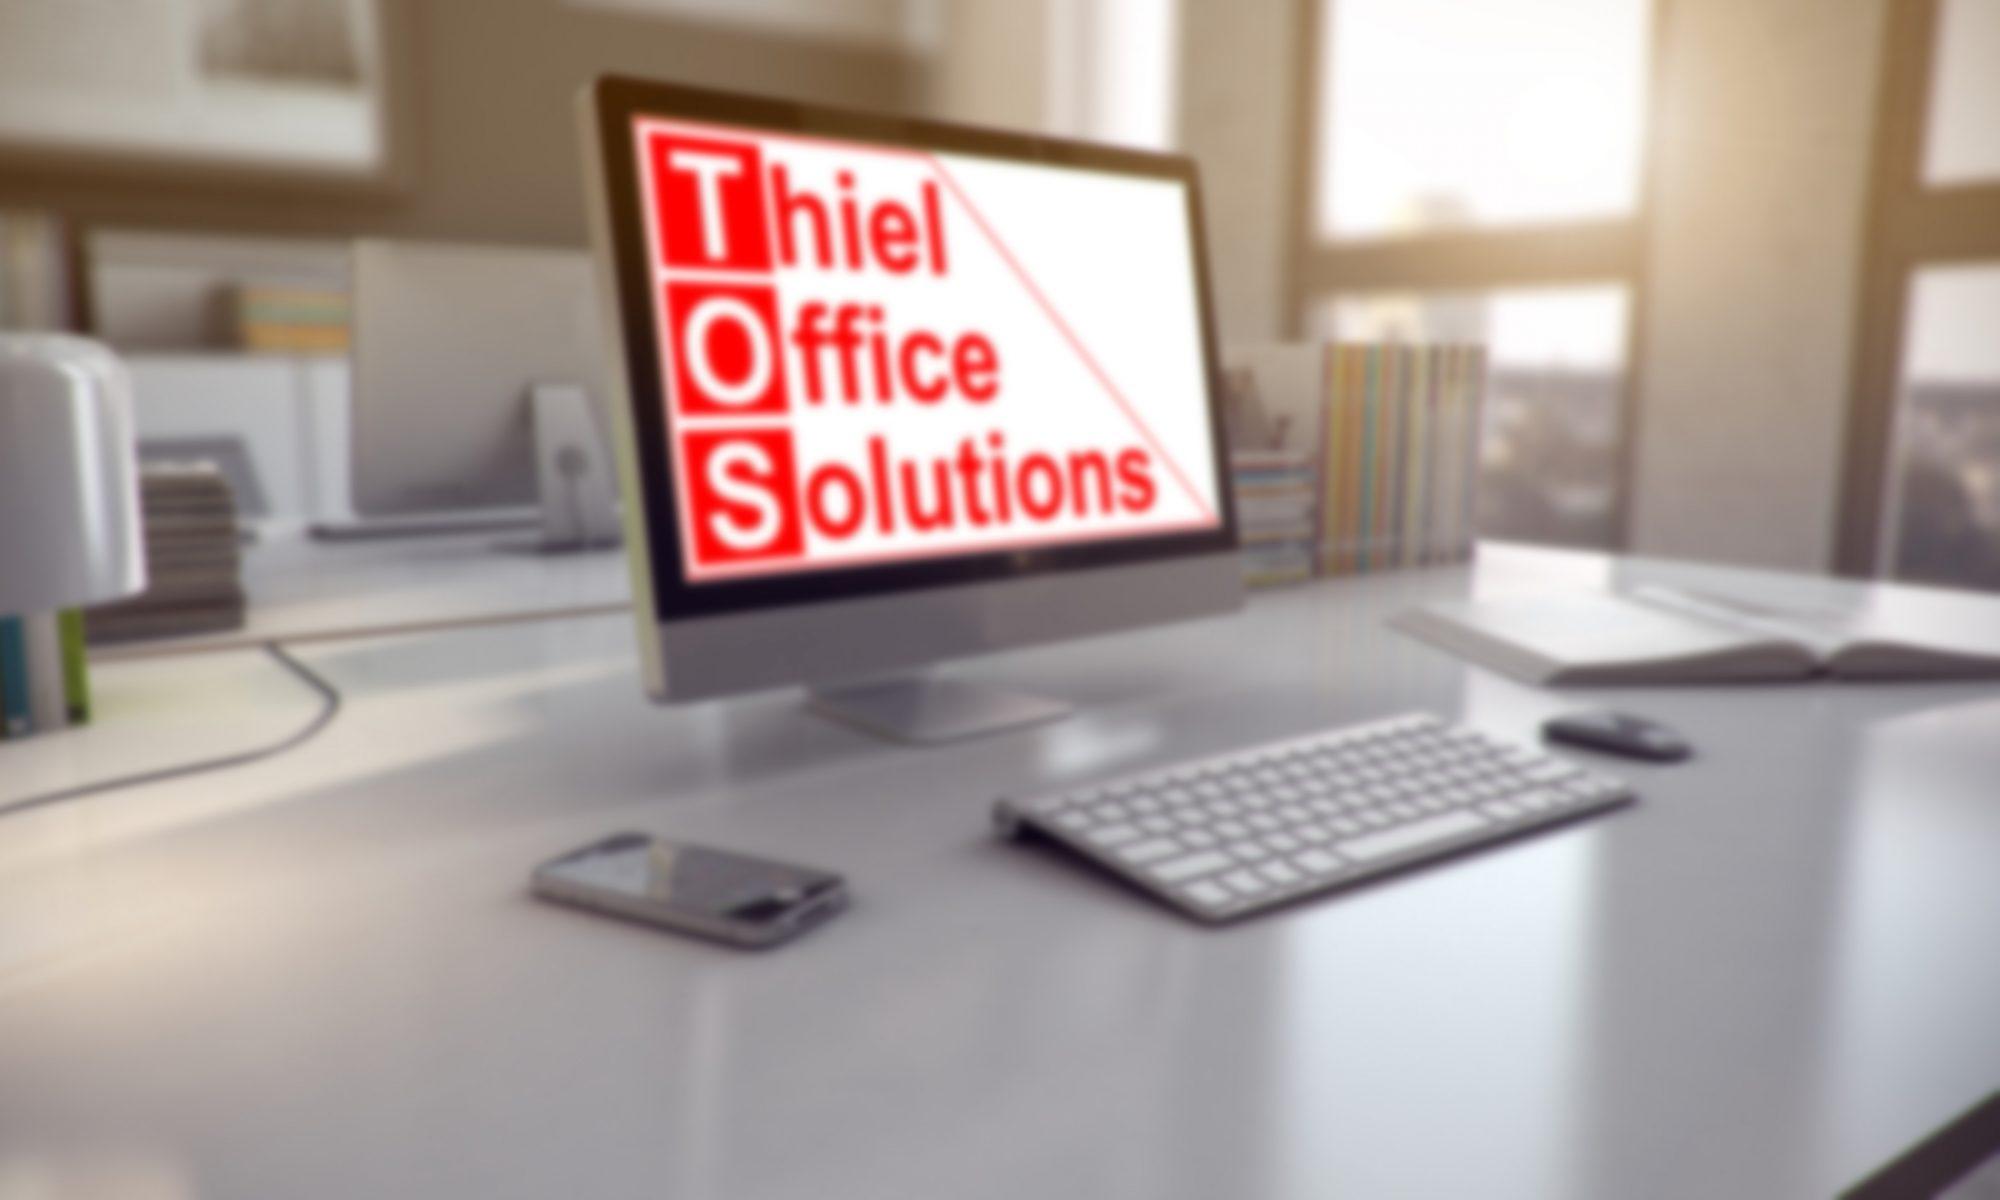 Thiel GbR - Thiel Office Solutions